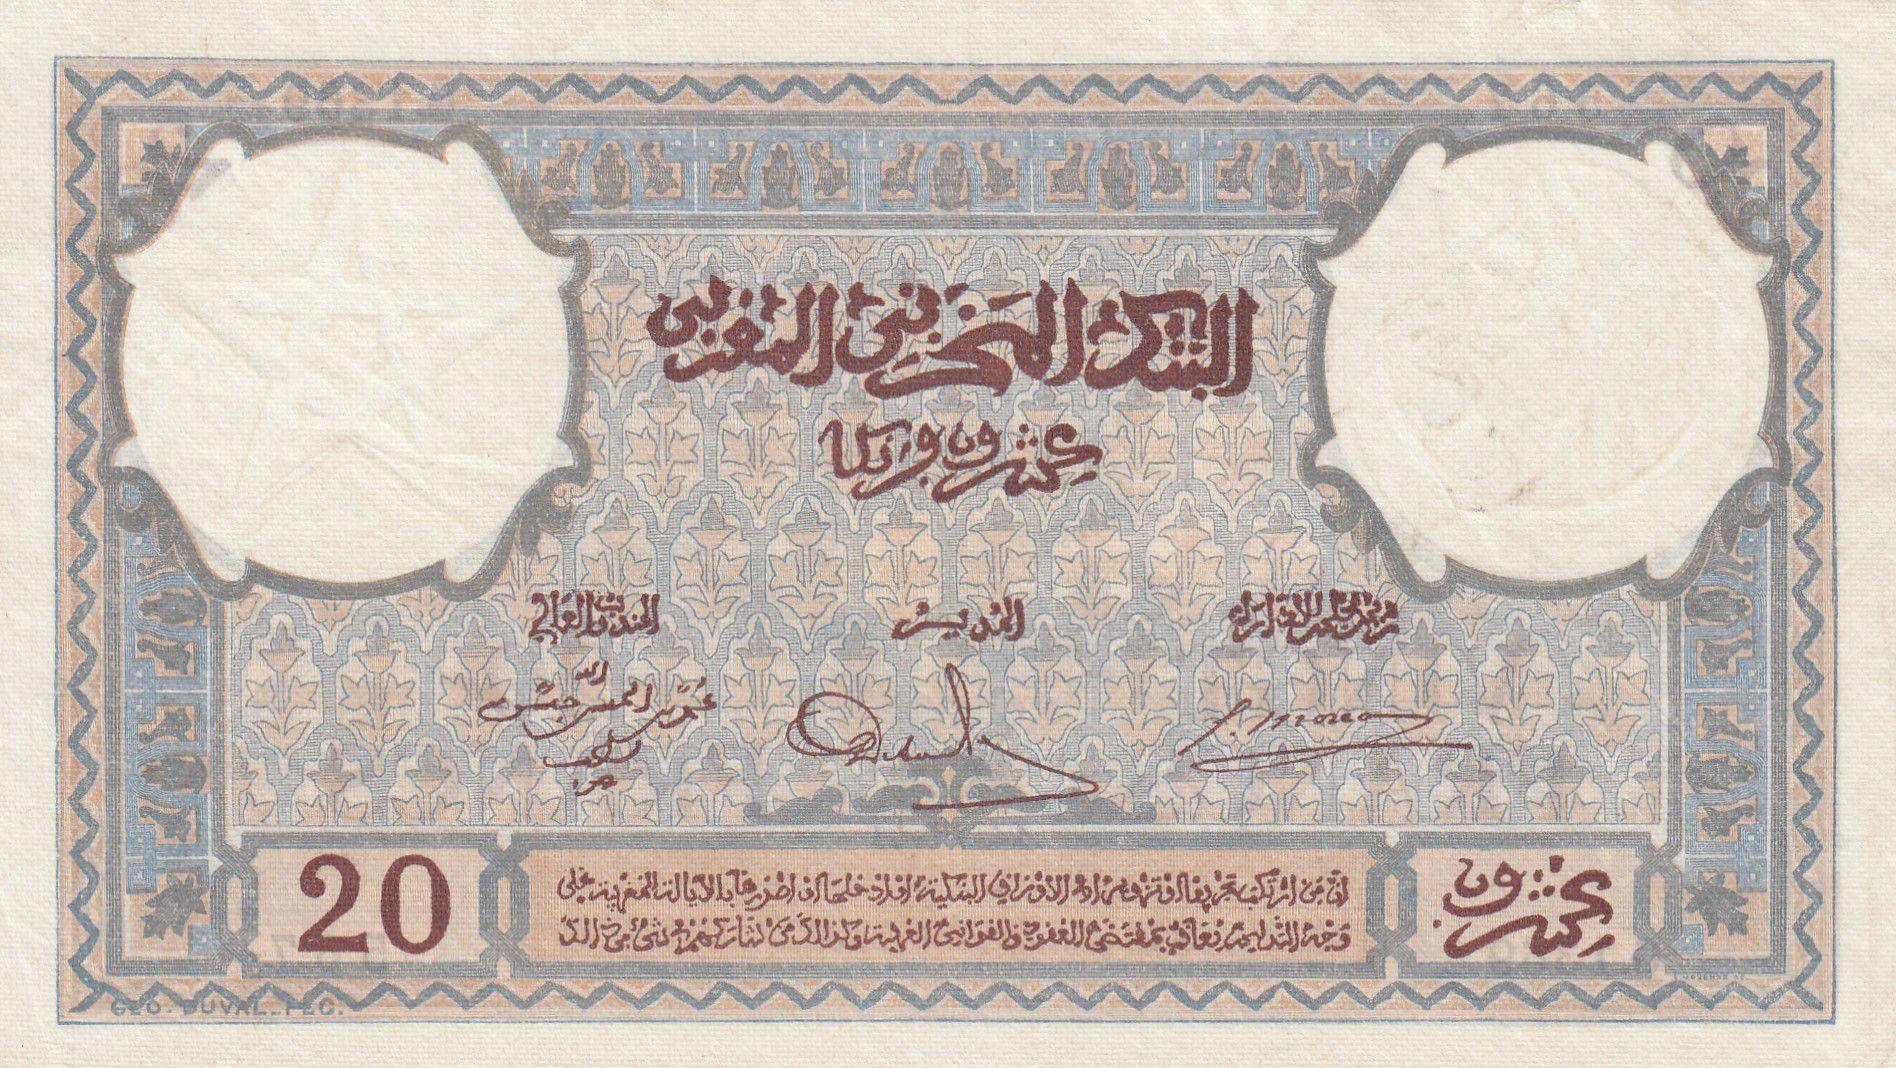 Maroc 20 Francs Minaret - 14-11-1941  -  TTB + - Série G.1369 - P.18b